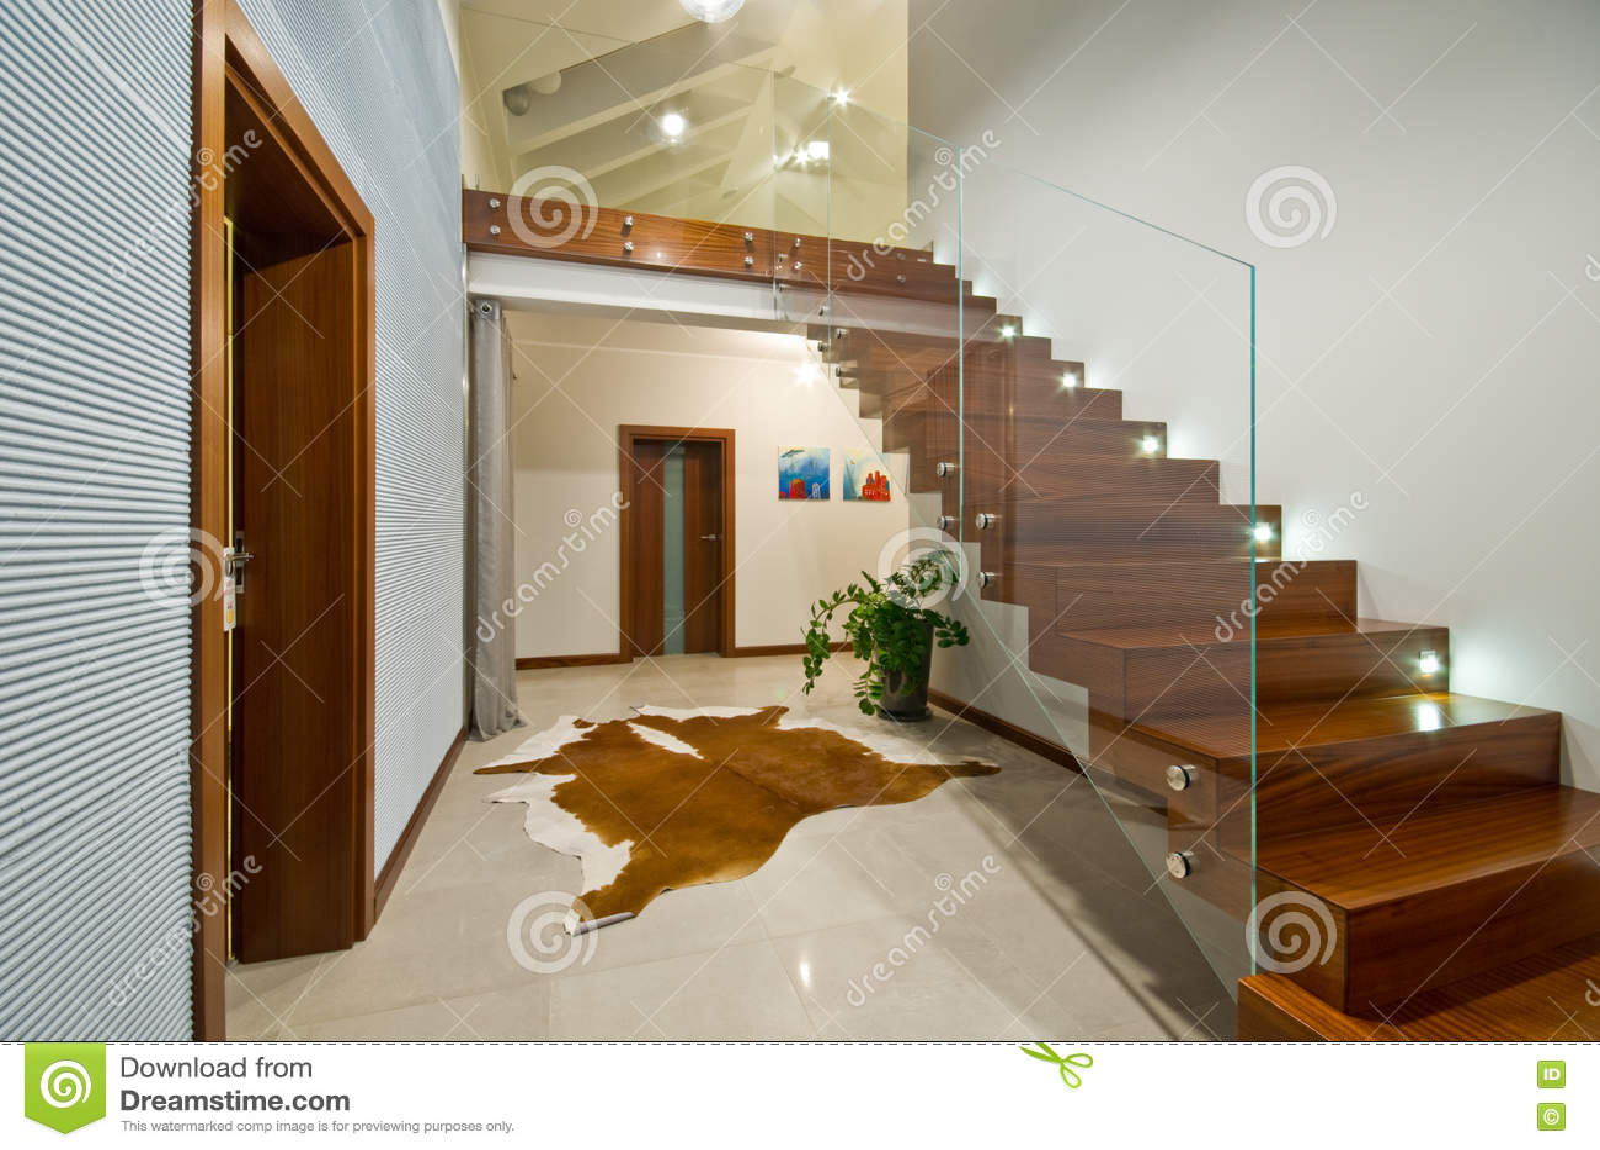 Escaliers Modernes Avec La Balustrade En Verre Photo stock - Image ...